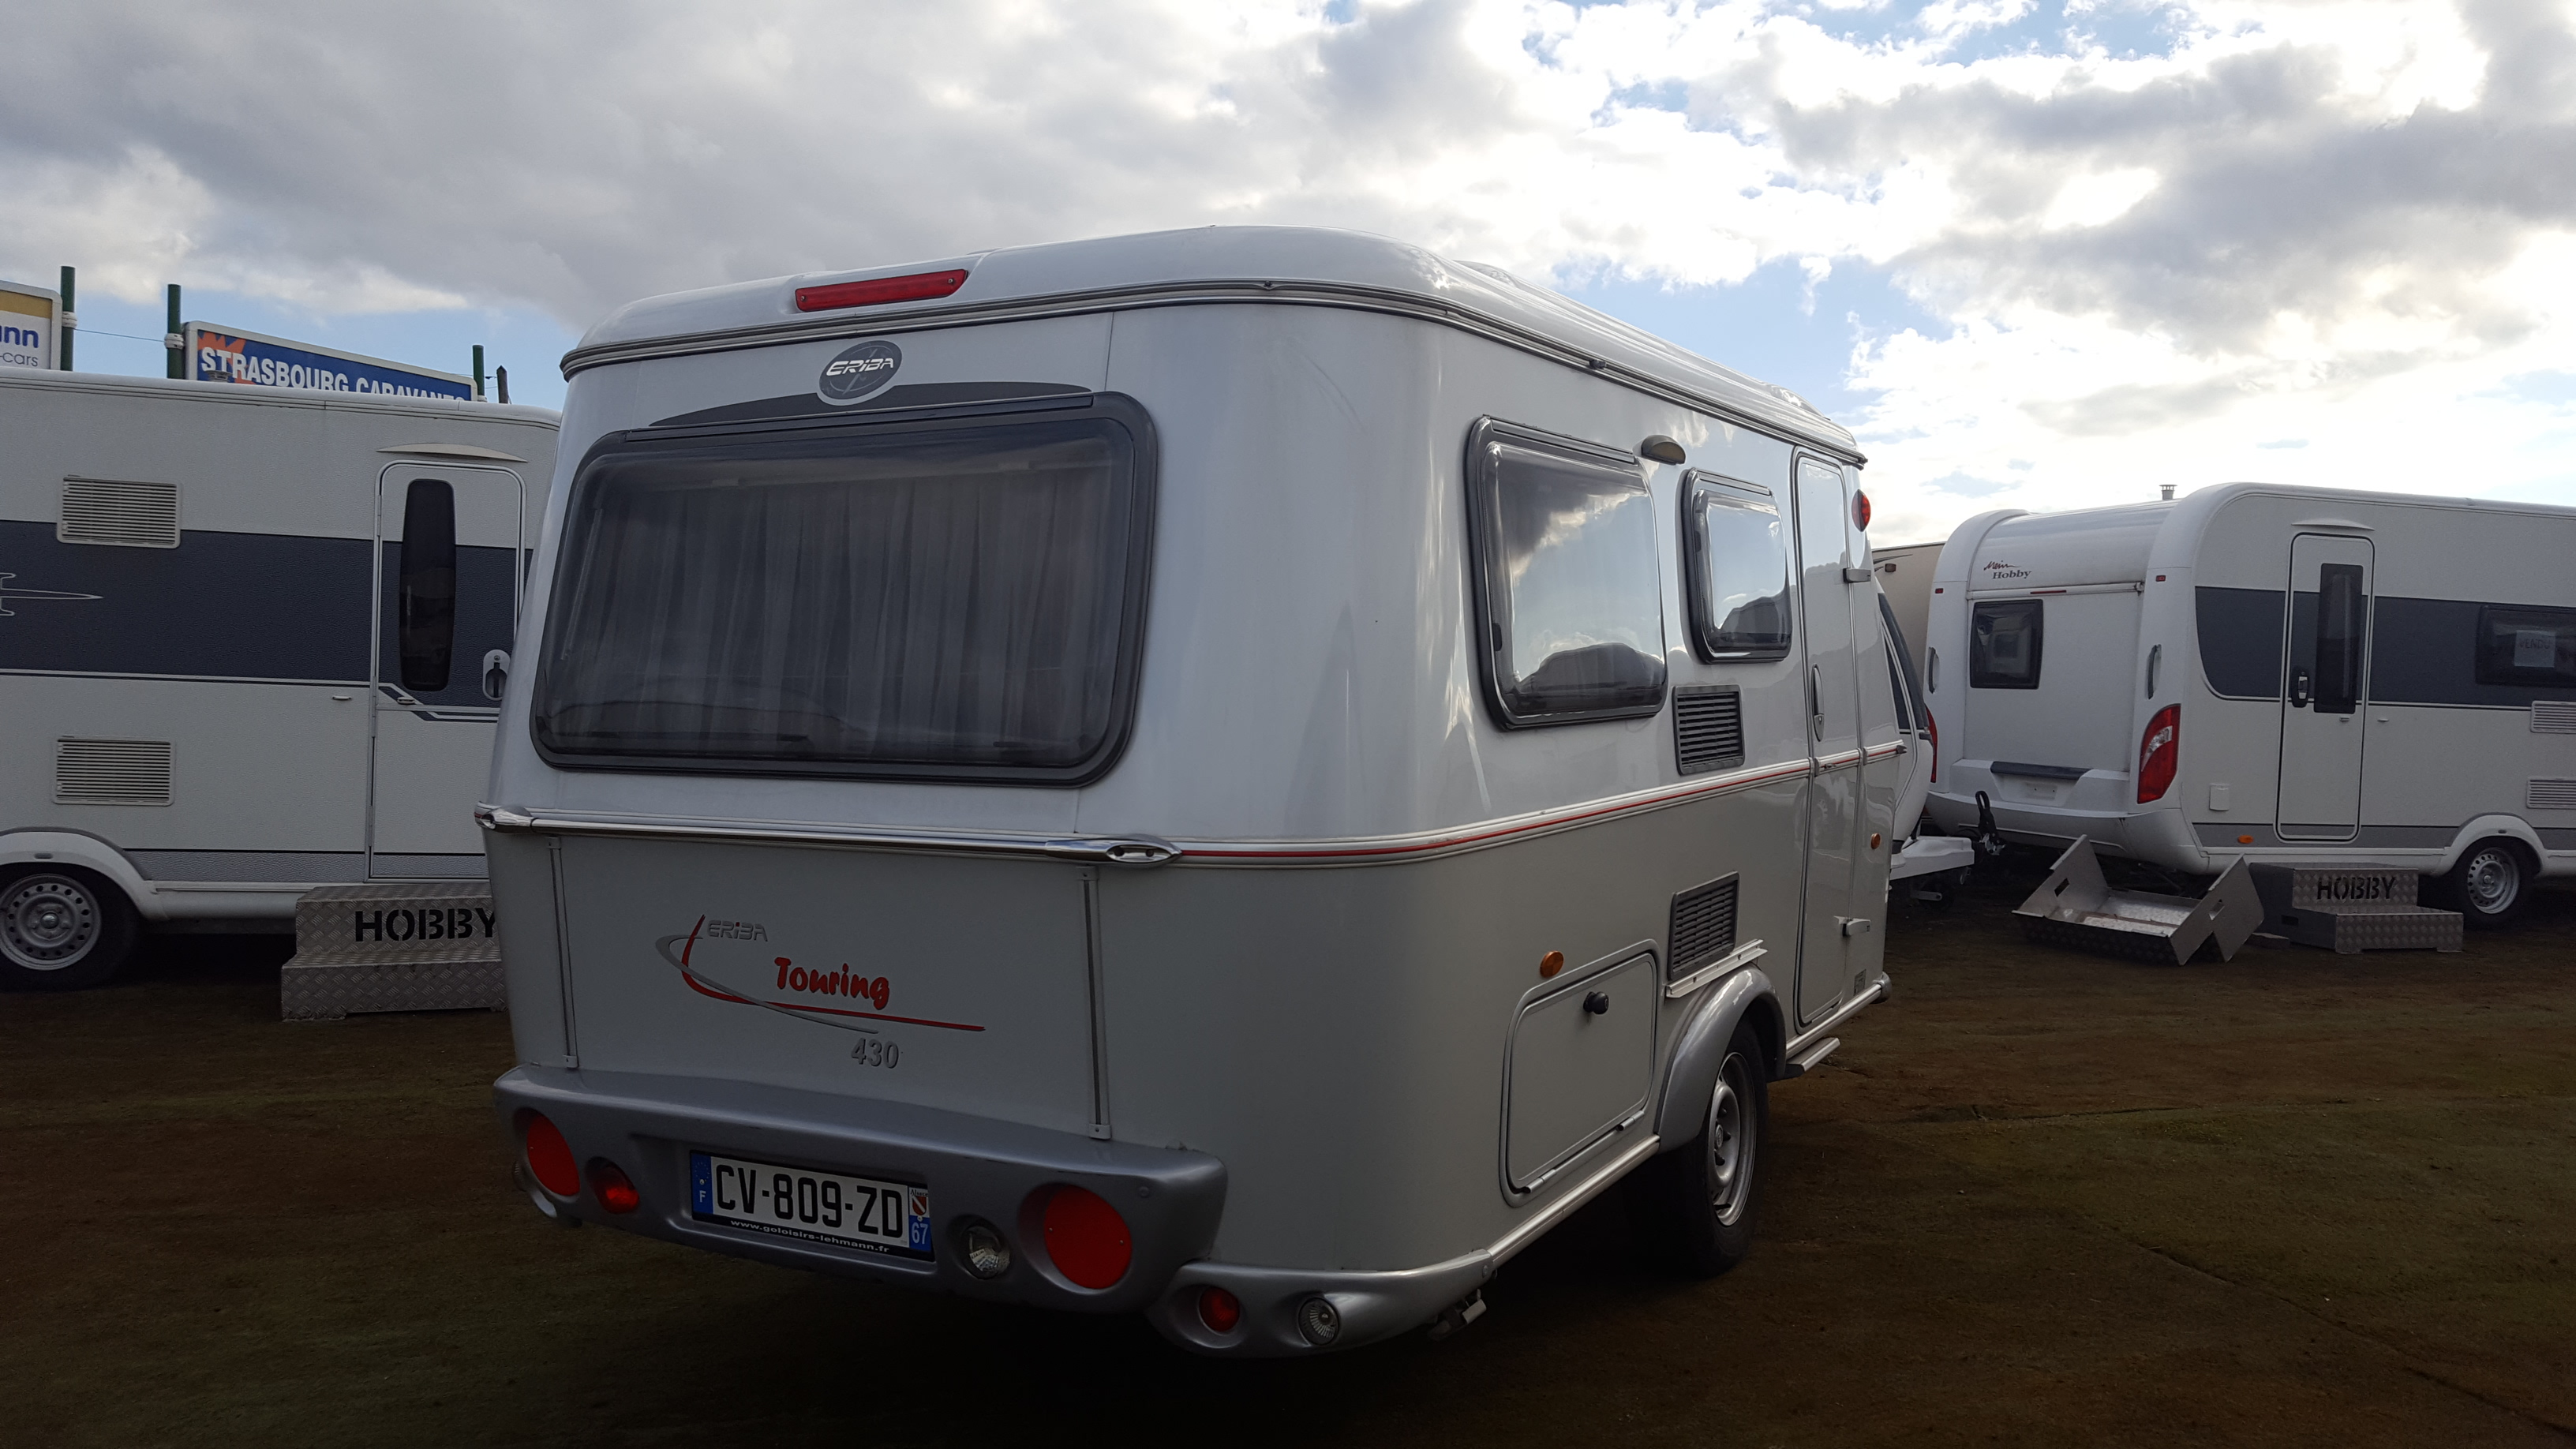 eriba touring 430 occasion de 2013 caravane en vente oberschaeffolsheim rhin 67. Black Bedroom Furniture Sets. Home Design Ideas